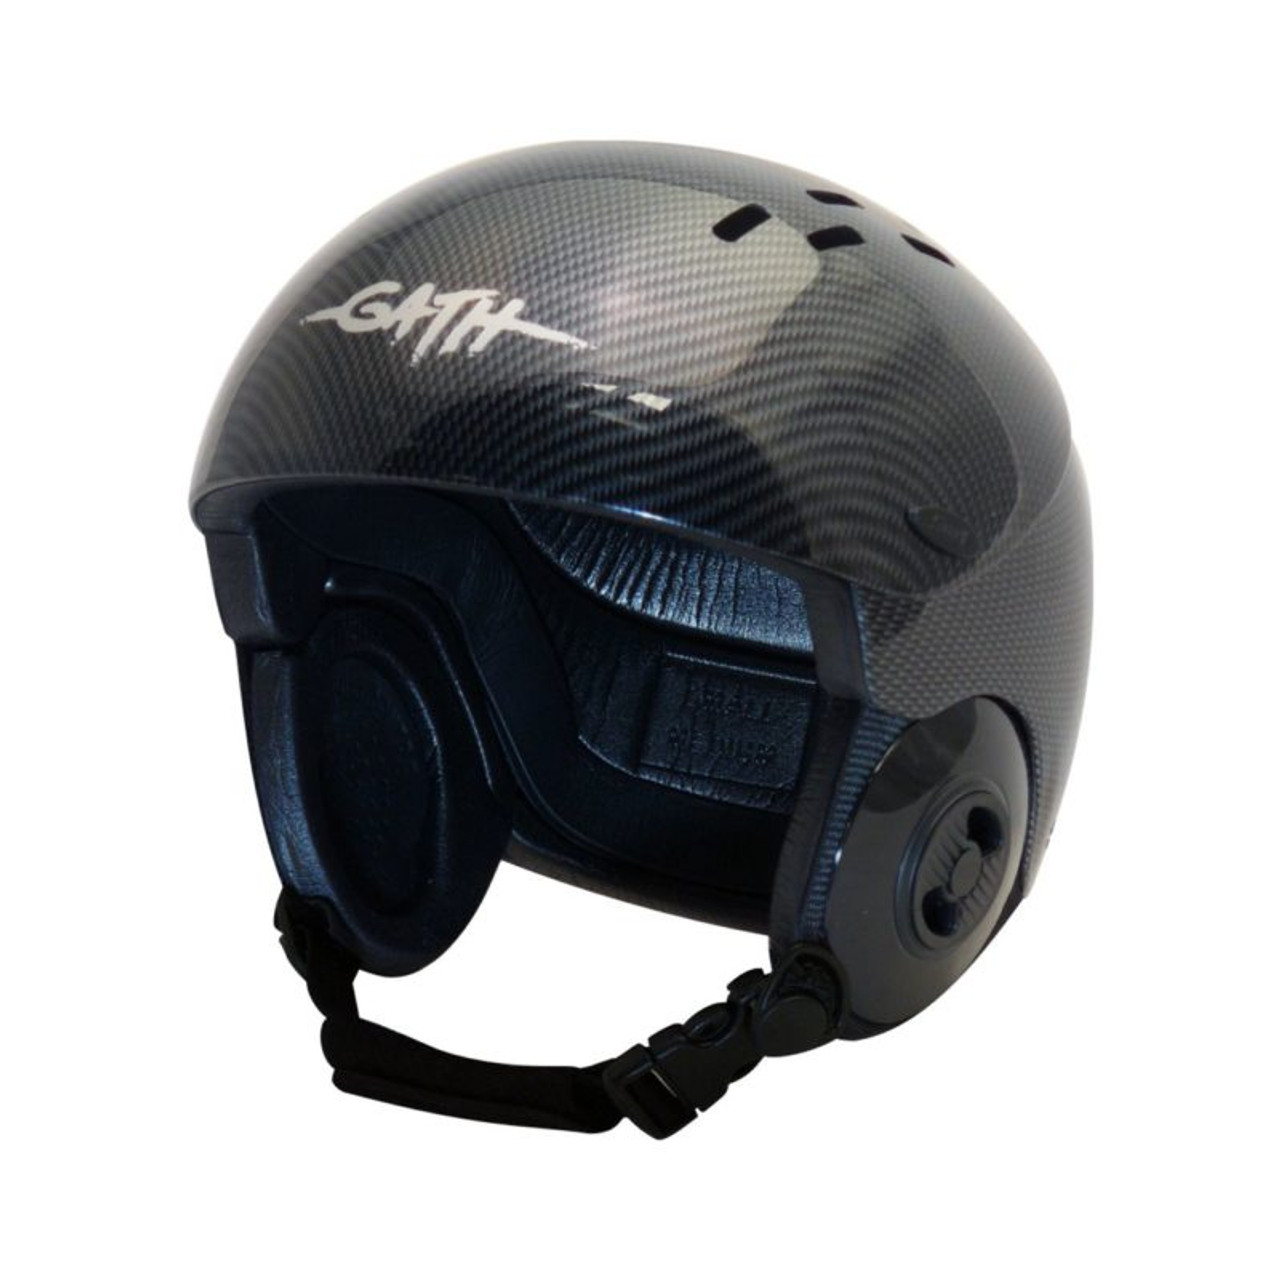 Gath Gedi Sports Helmet - Carbon Print